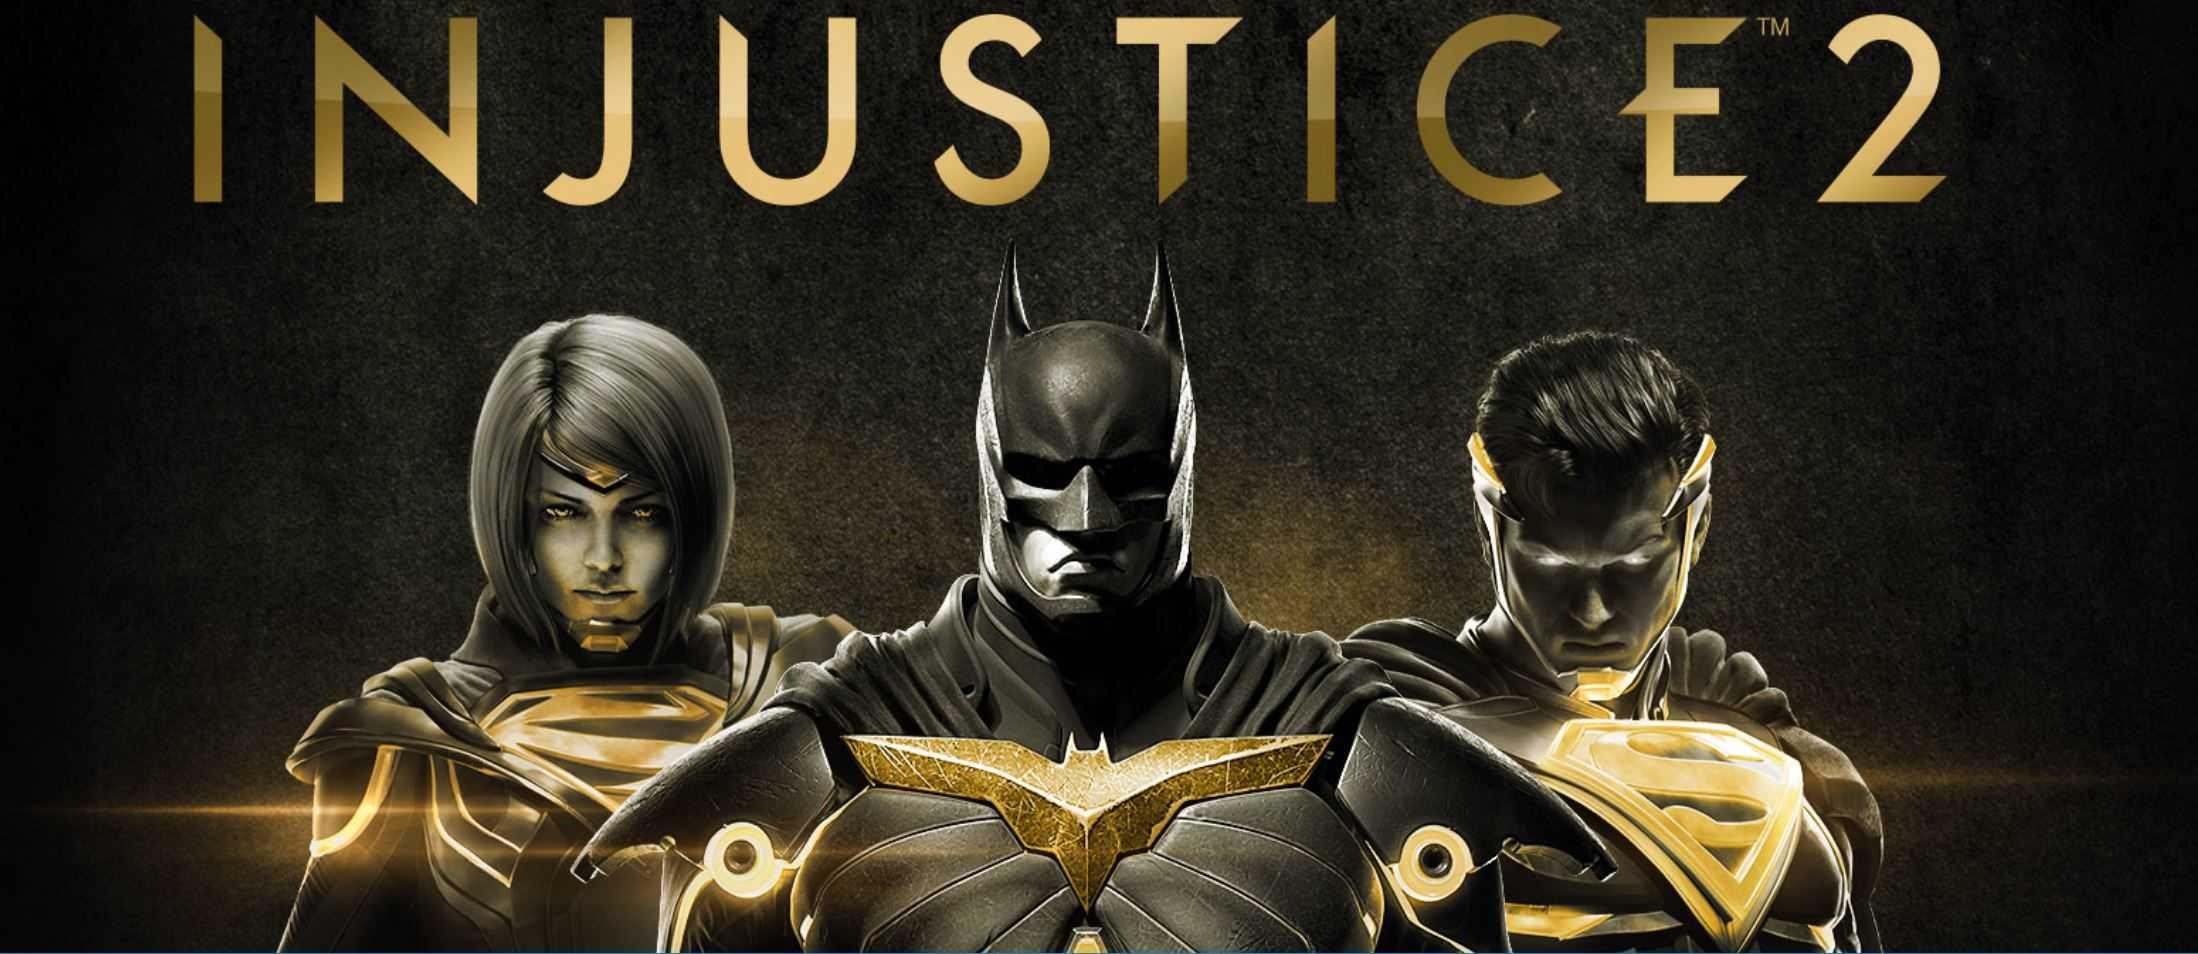 injustice 2 legendary edition - Warner Bros annuncia Injustice 2 Legendary Edition